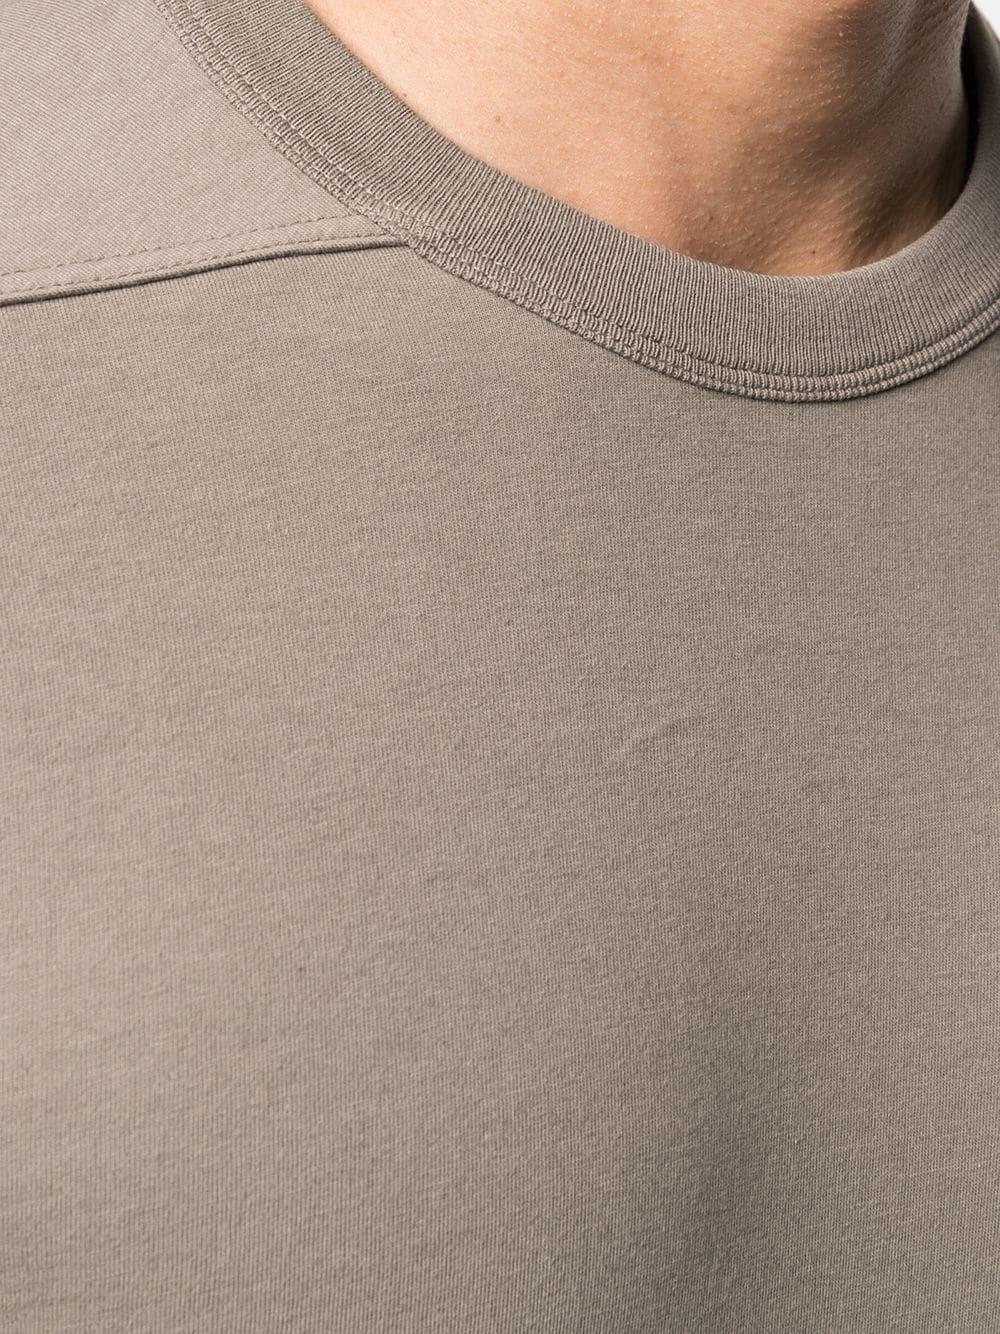 LONG SLEEVE T-SHIRT RICK OWENS | T-shirts | RU21S6266 JA34